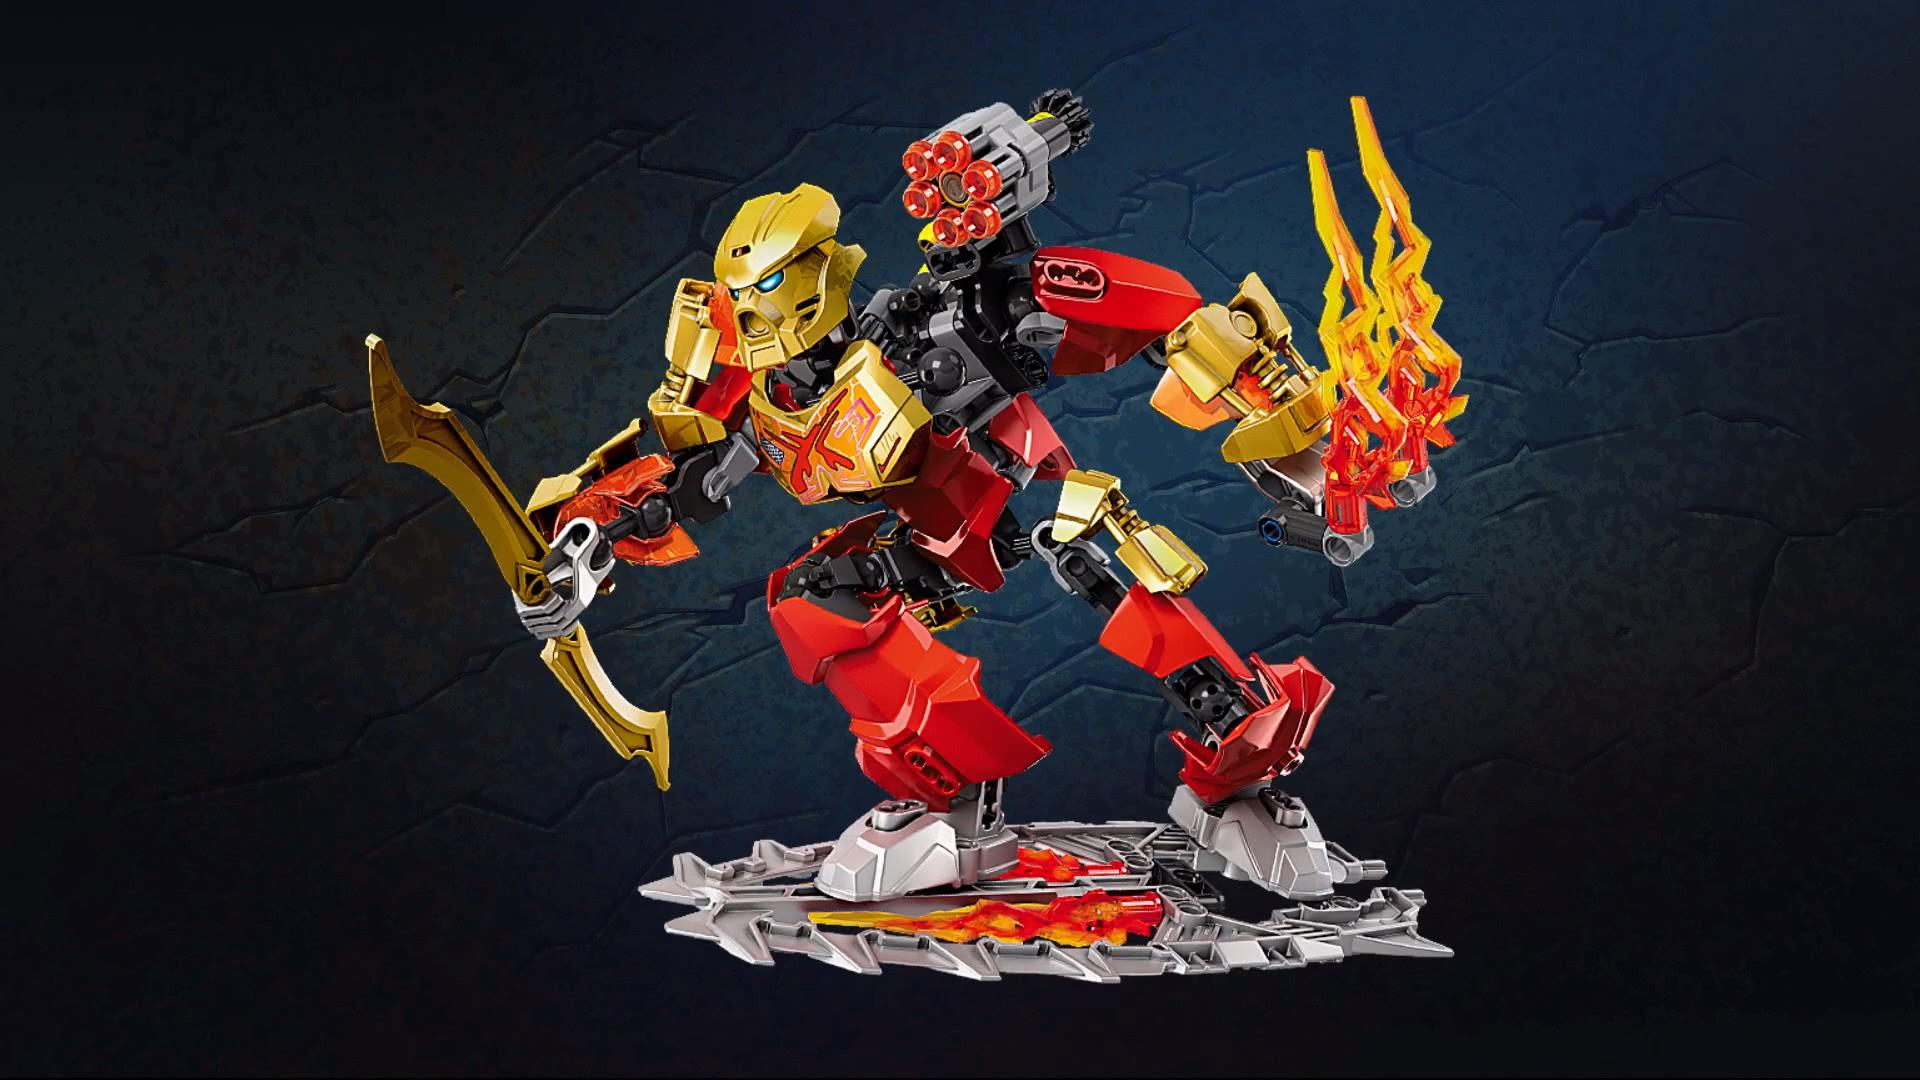 bionicles2.jpg